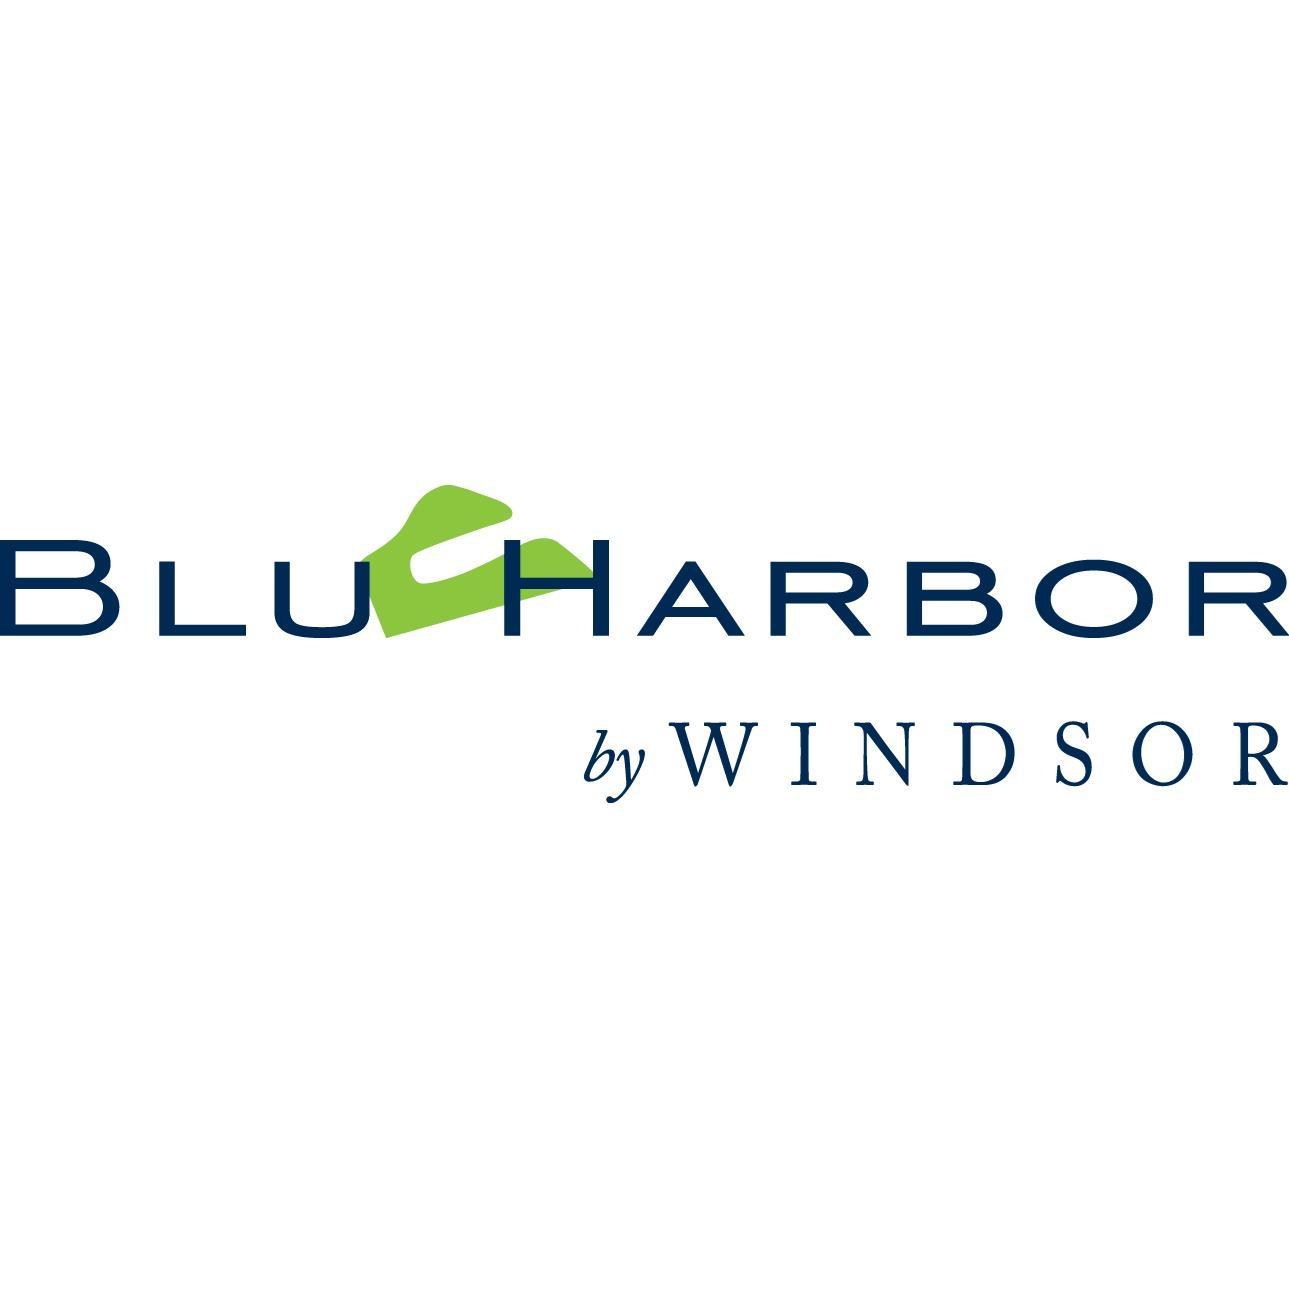 Blu Harbor by Windsor